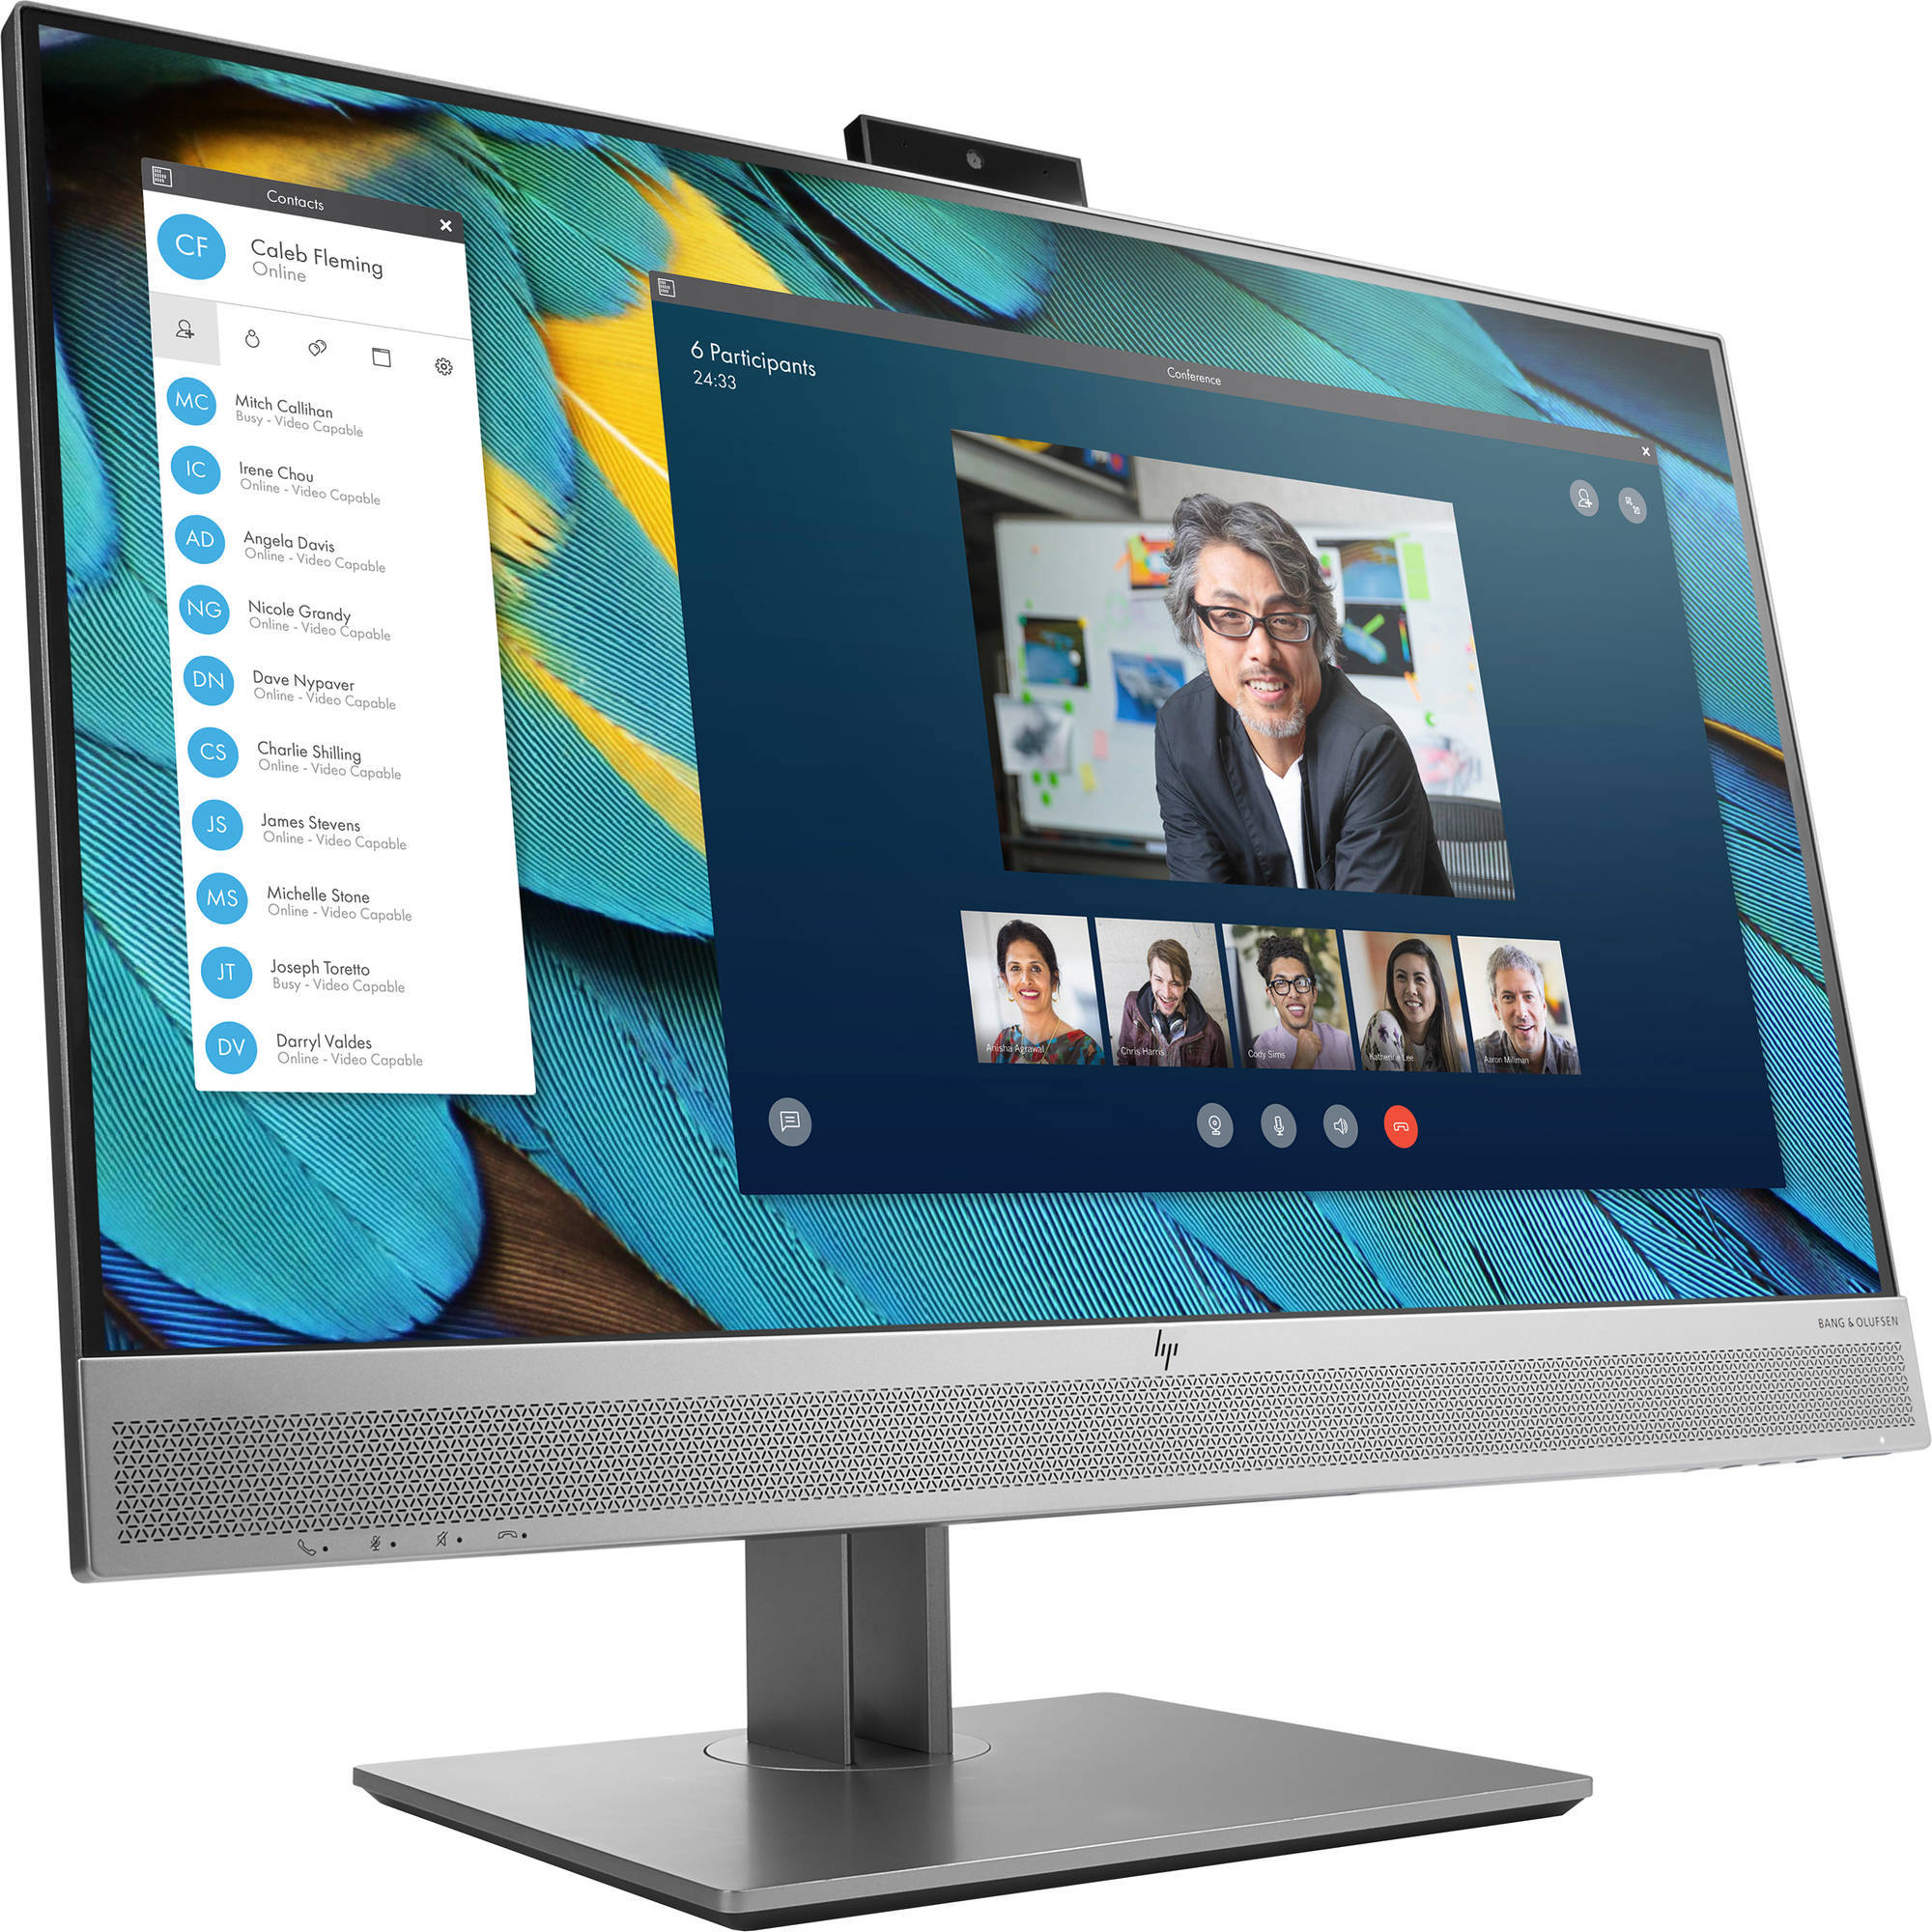 HP EliteDisplay E243m 23.8-inch Monitor (1FH48A8)